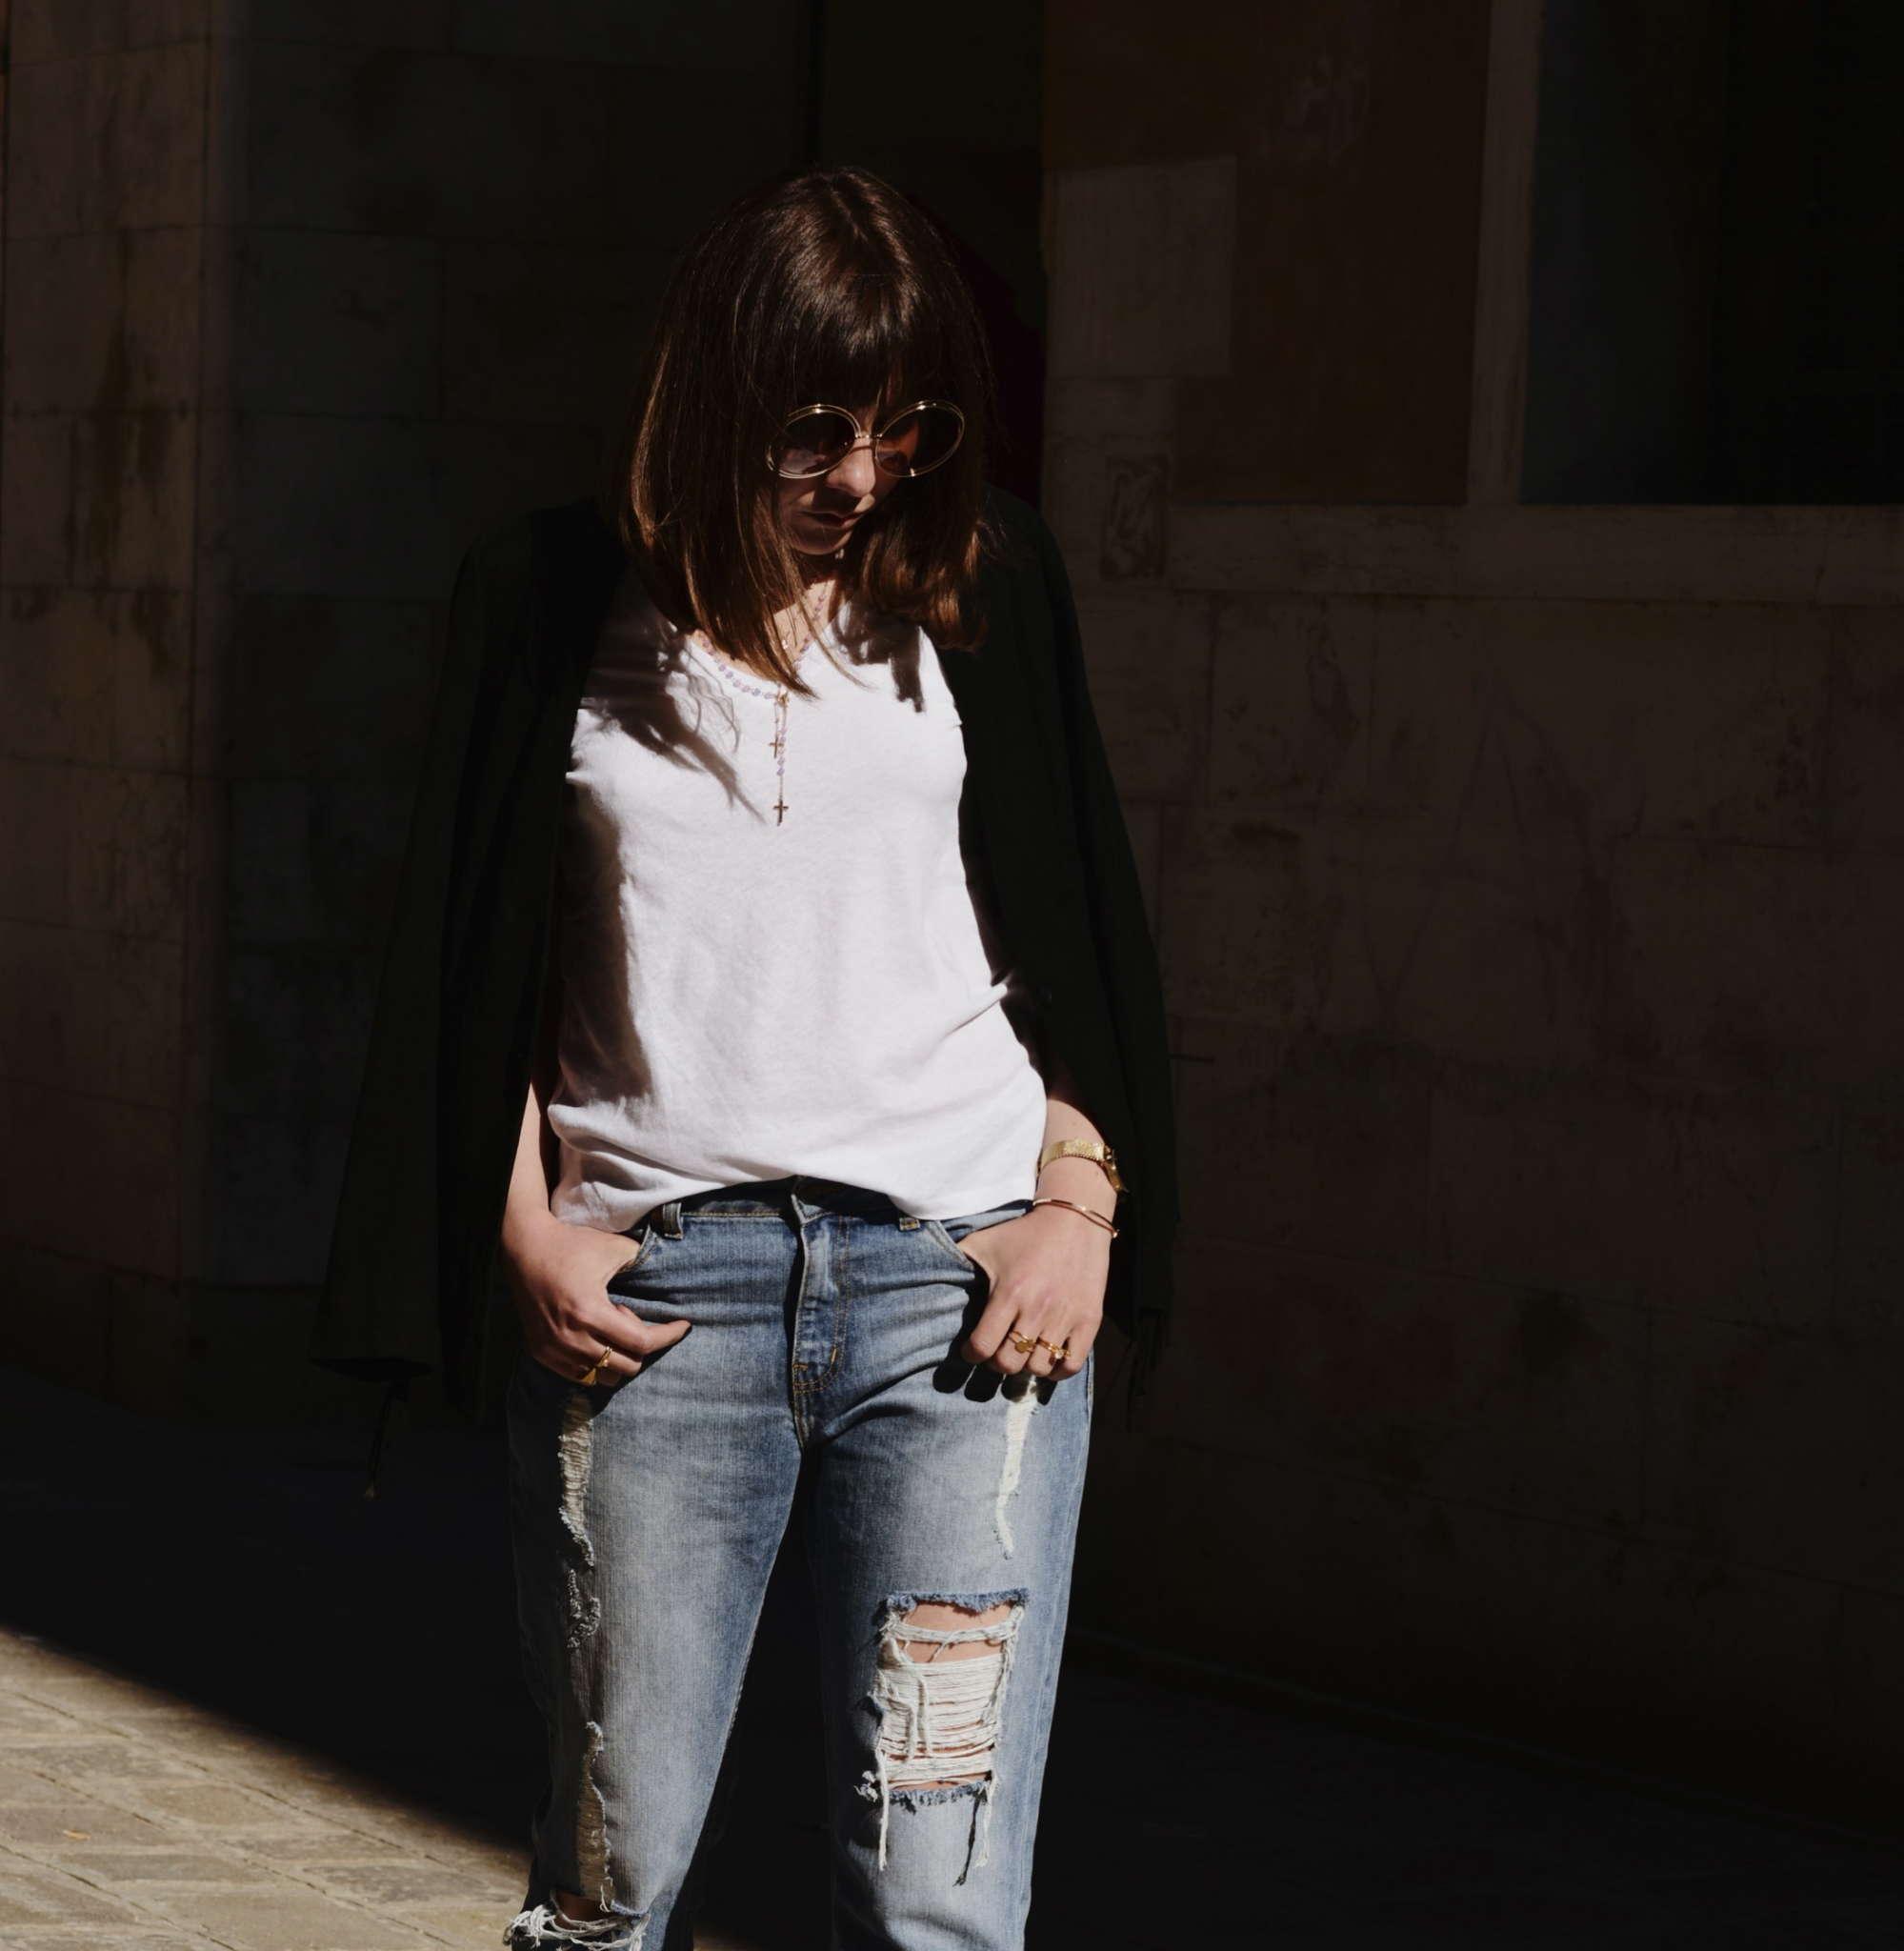 AMEN-boyfriend-jeans-denim-dricoper-fringe-jacket-jewelrybyad-Levi's-nike-cortez-rosary-choker-round-sunglasses-stylebutler-western-jacket-white-sneakers-white-tshirt-zerouv